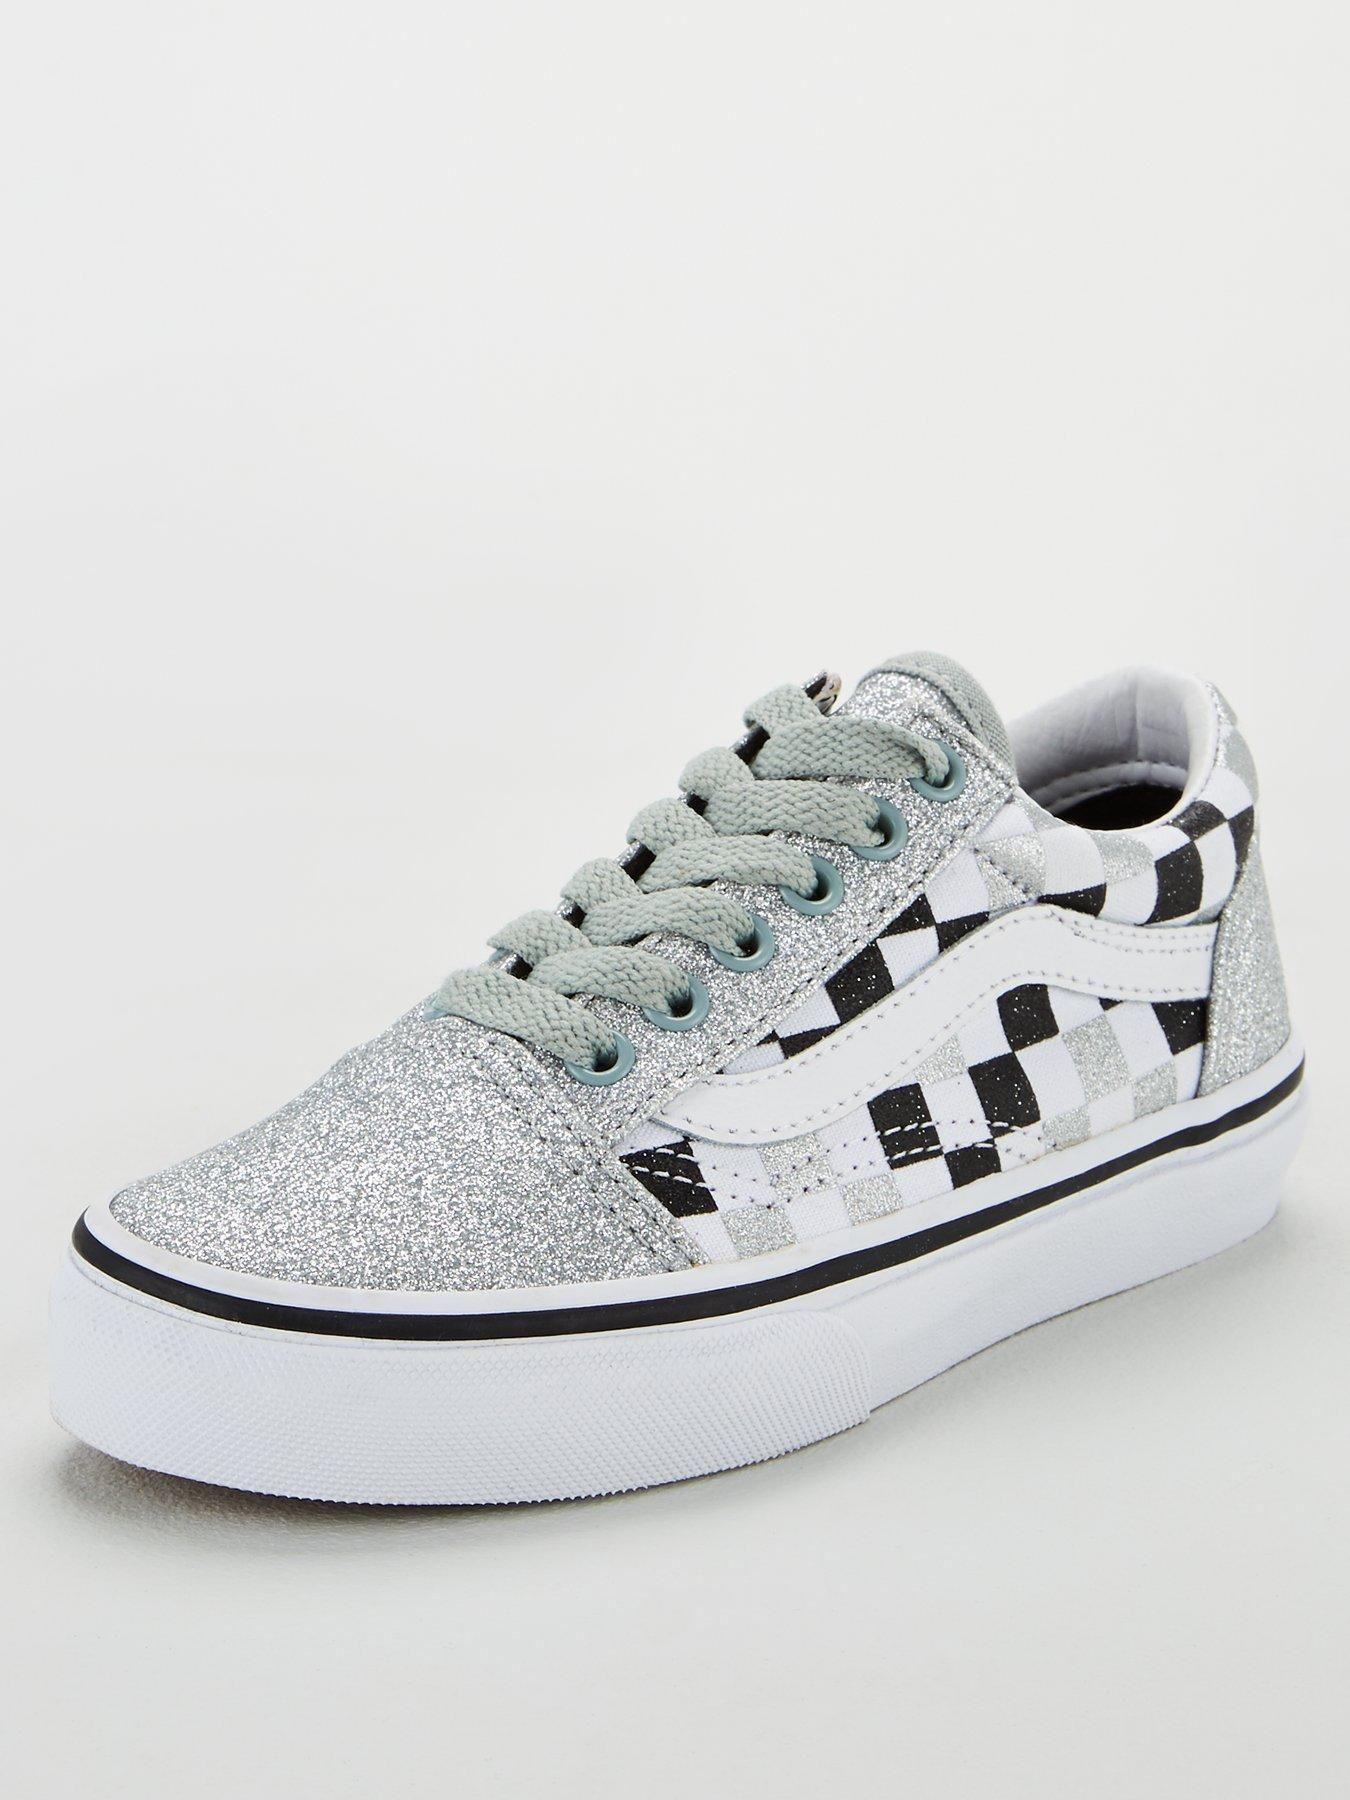 Vans Old Skool Checkerboard Childrens Trainers Silver